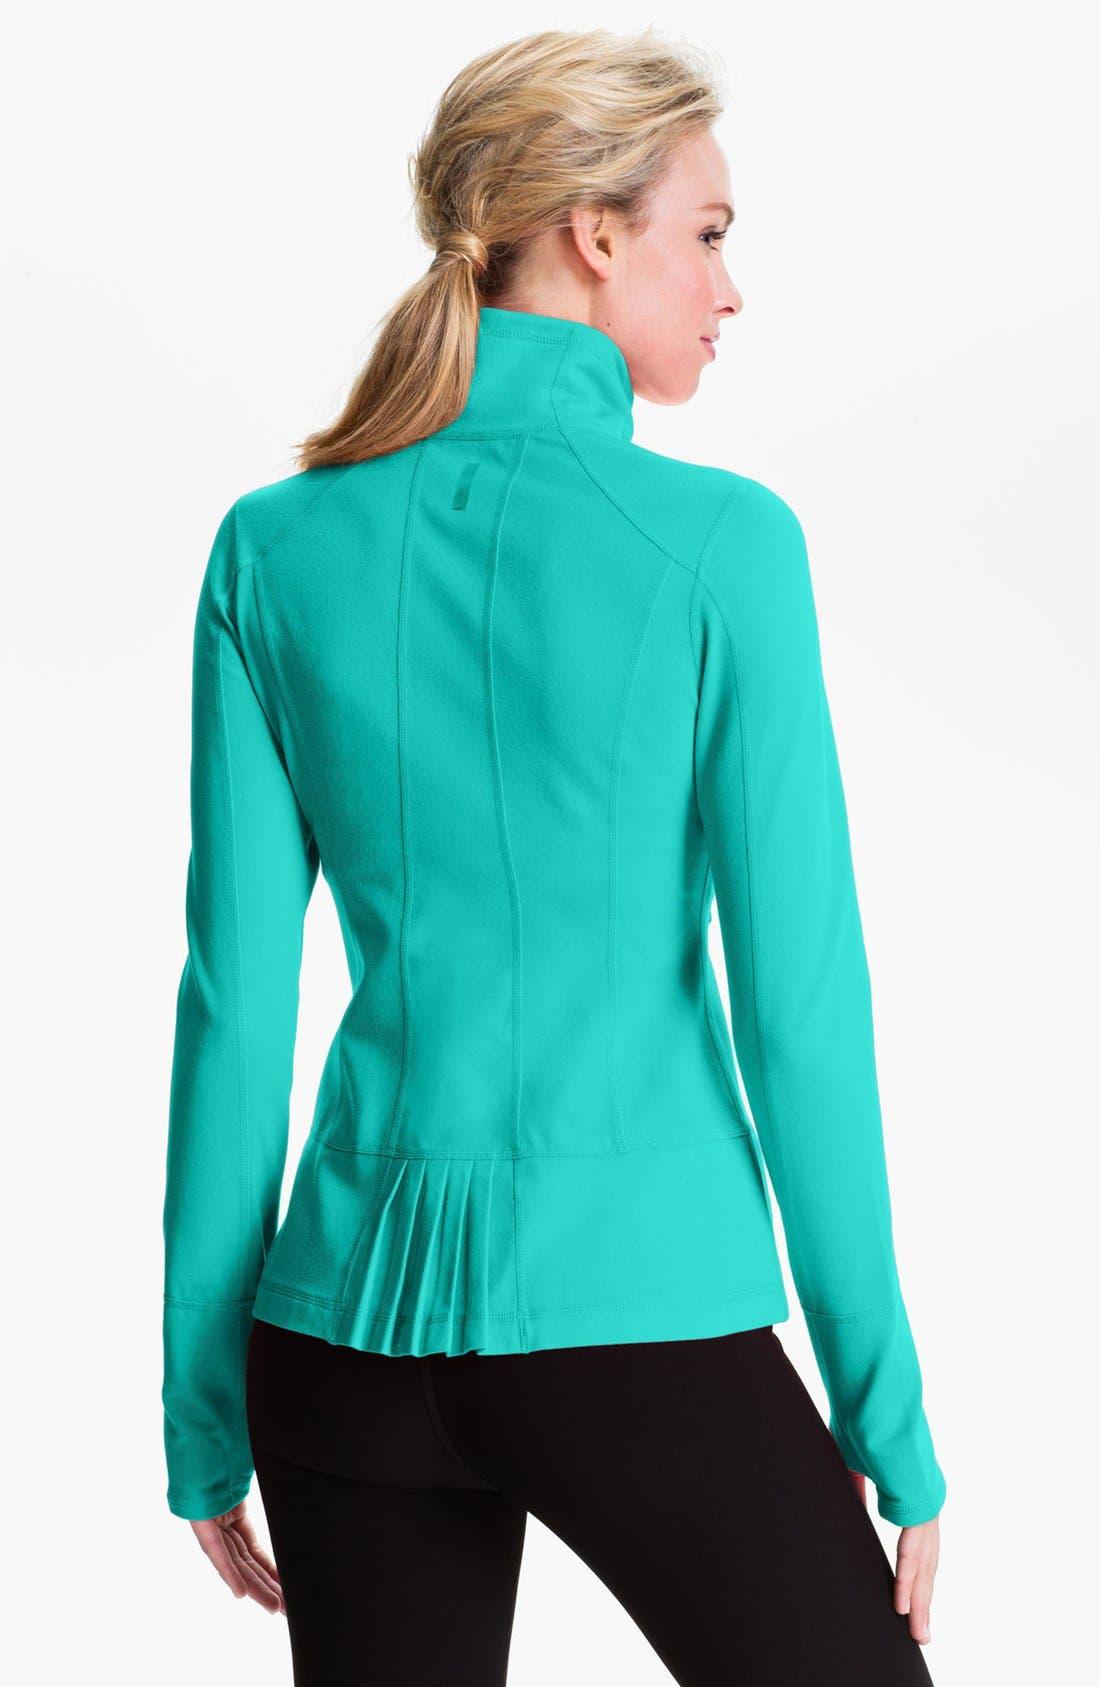 Alternate Image 1 Selected - Zella 'Allison' Back Pleat Jacket